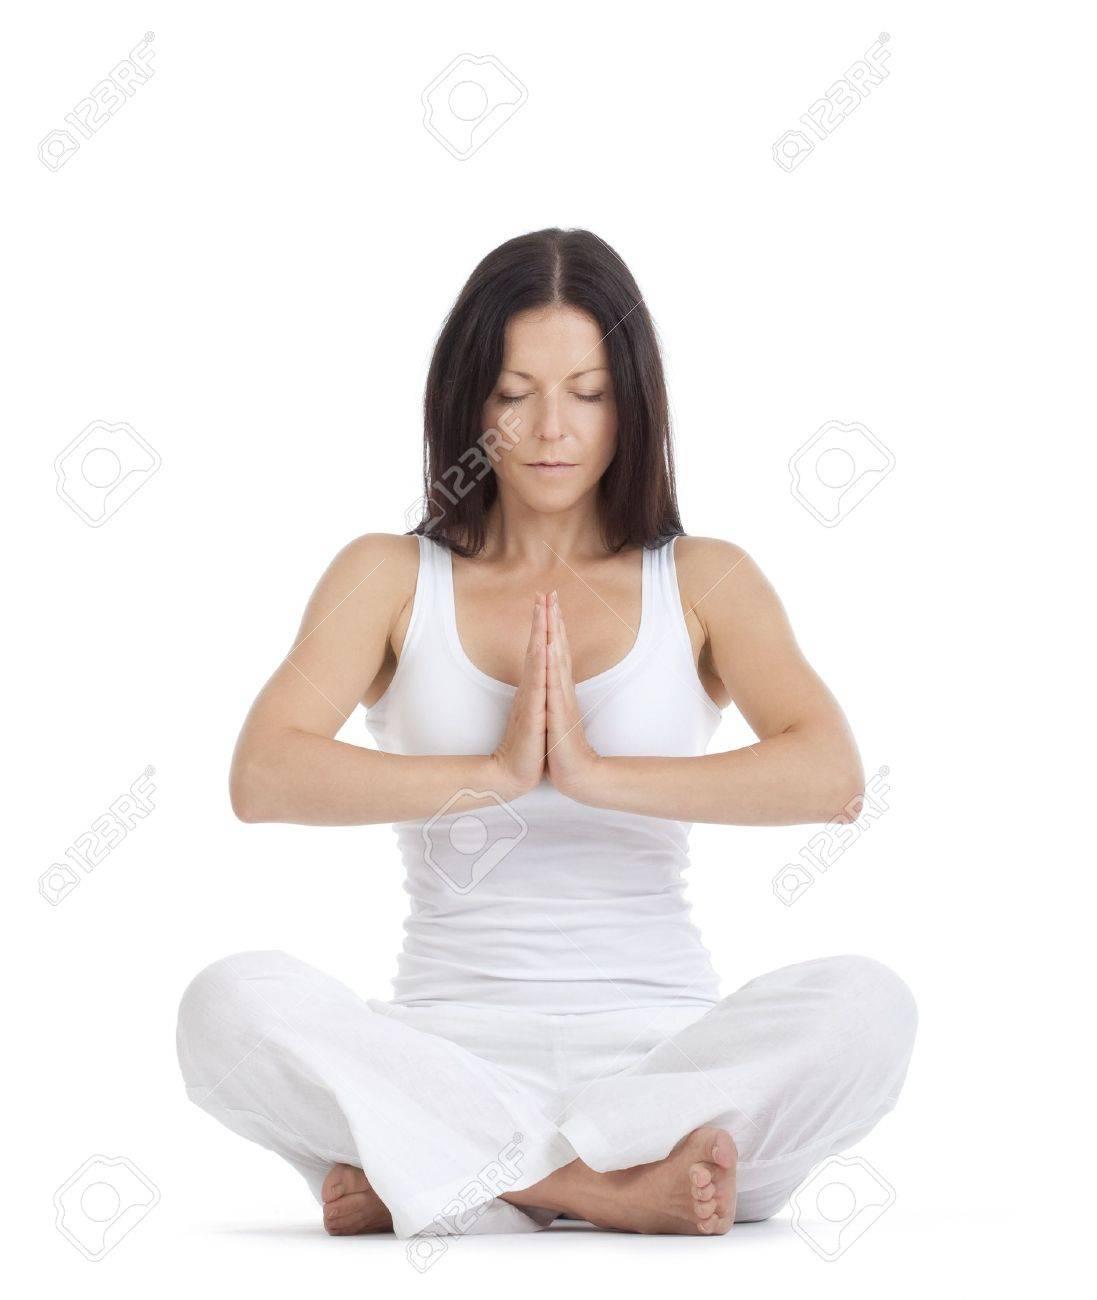 woman sitting on the floor exercising yoga - isolated on white Stock Photo - 10458242